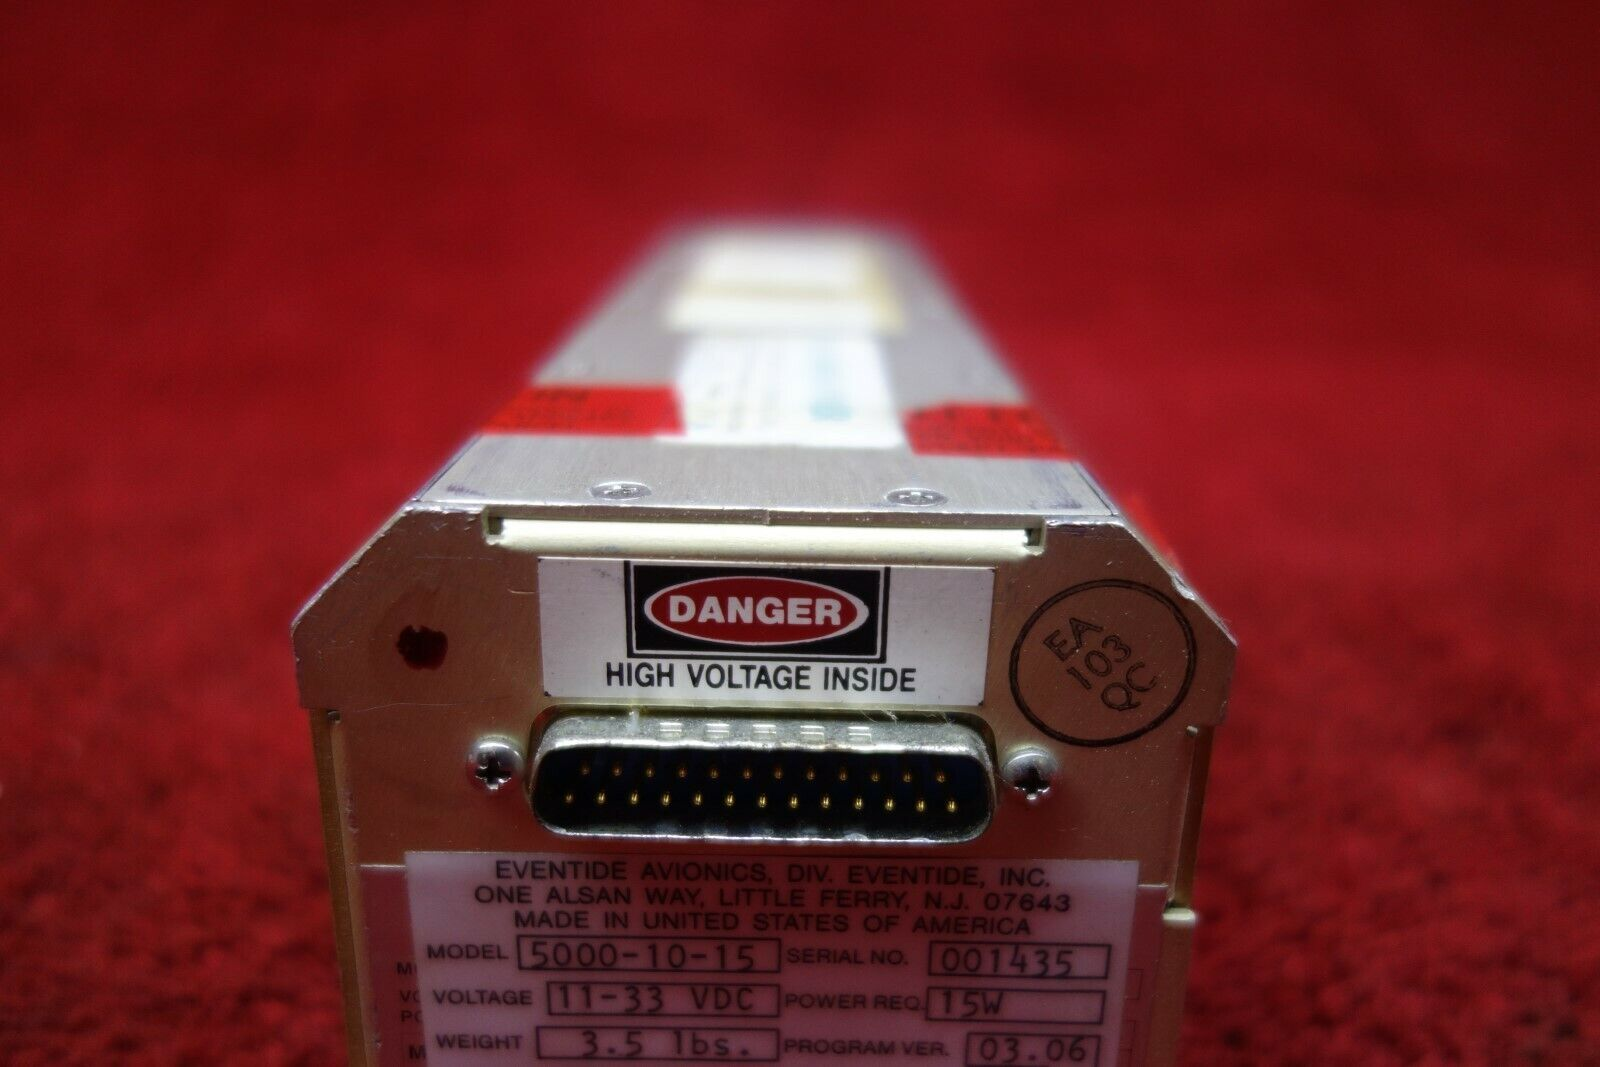 Eventide Avionics ARGUS 5000-10-15 Moving Map Display Indicator 11-33V